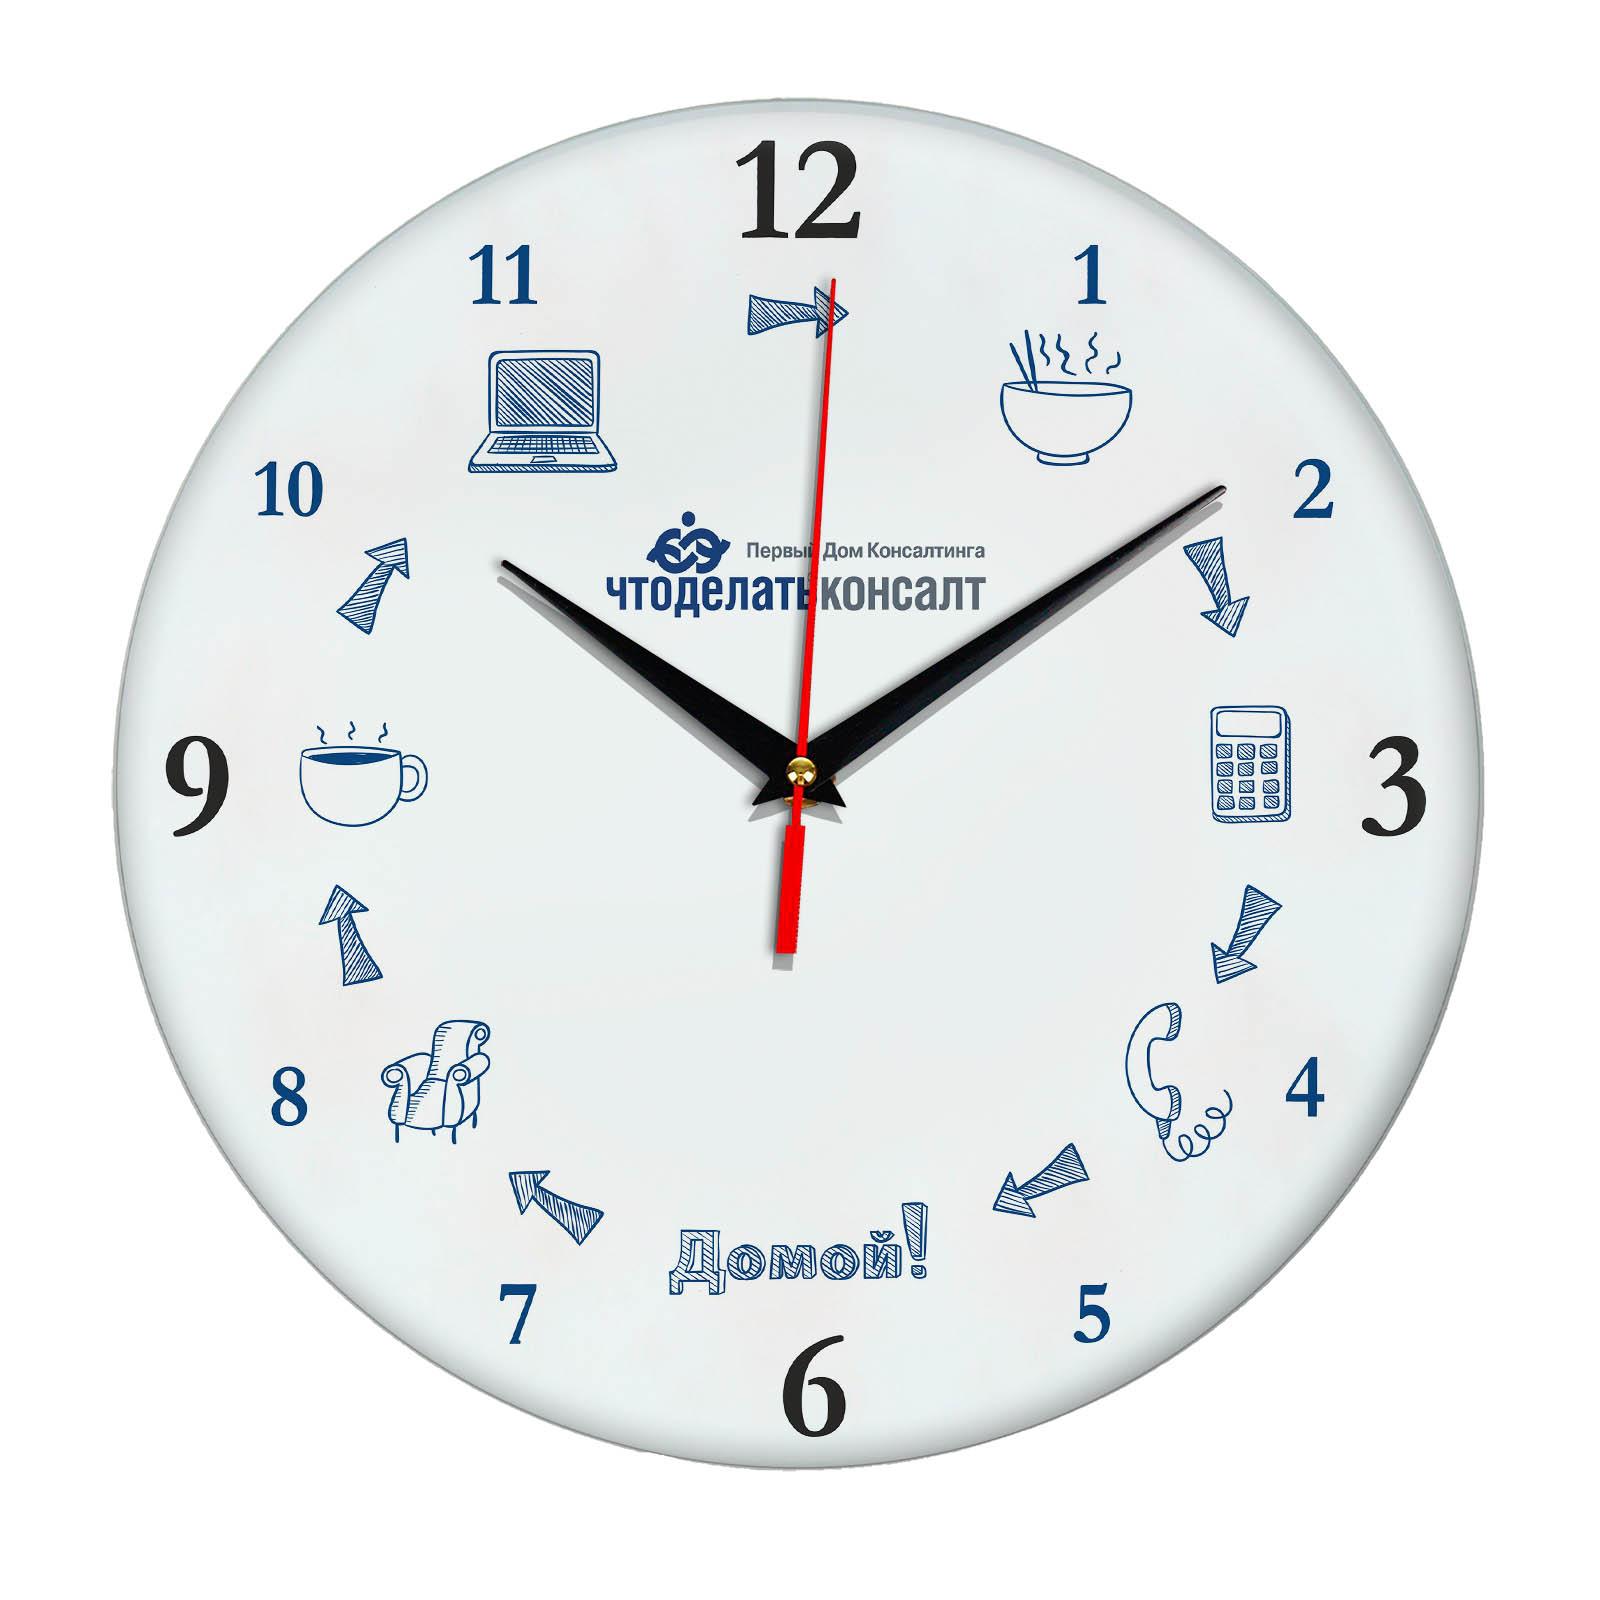 Настенные часы «chtodelatconsalt»